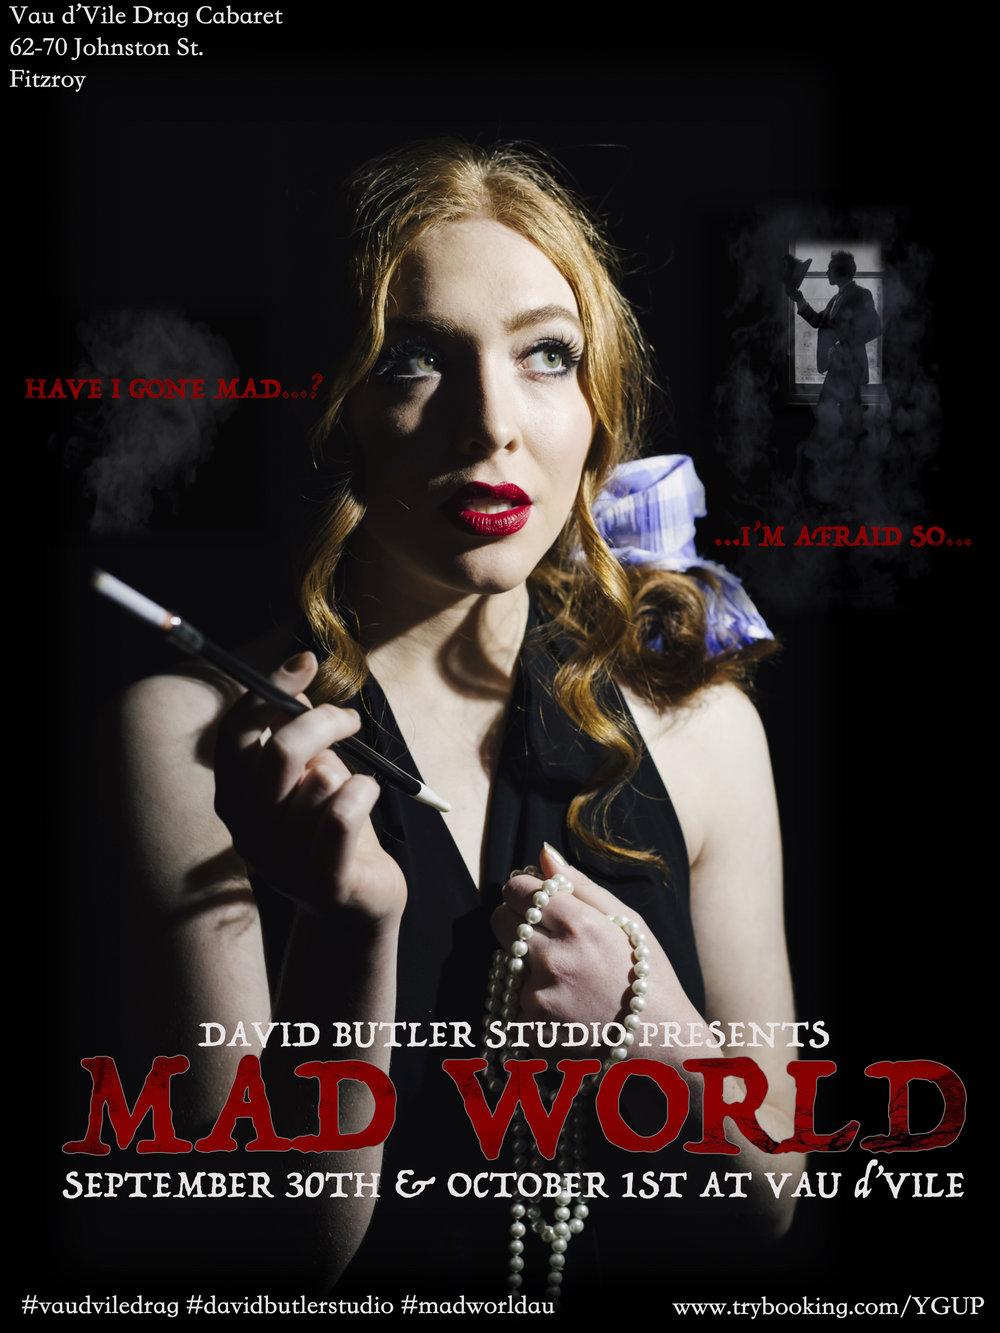 MAD WORLD Alice Poster.jpg